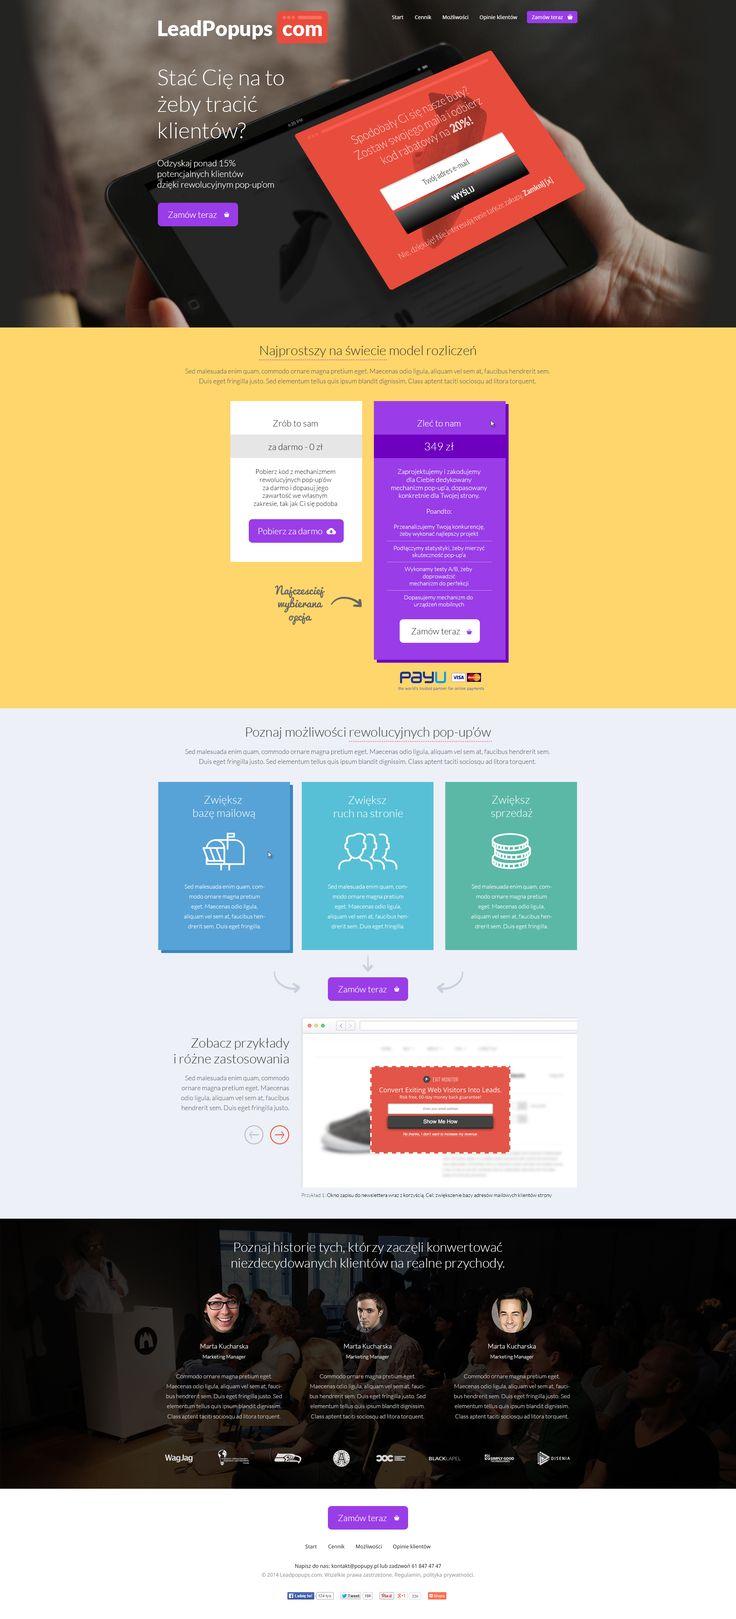 Lead Popups Webdesign #webdesign #web #design #piotr #wolniewicz #portfolio #inspiration #art #direction #landing #page #corporate